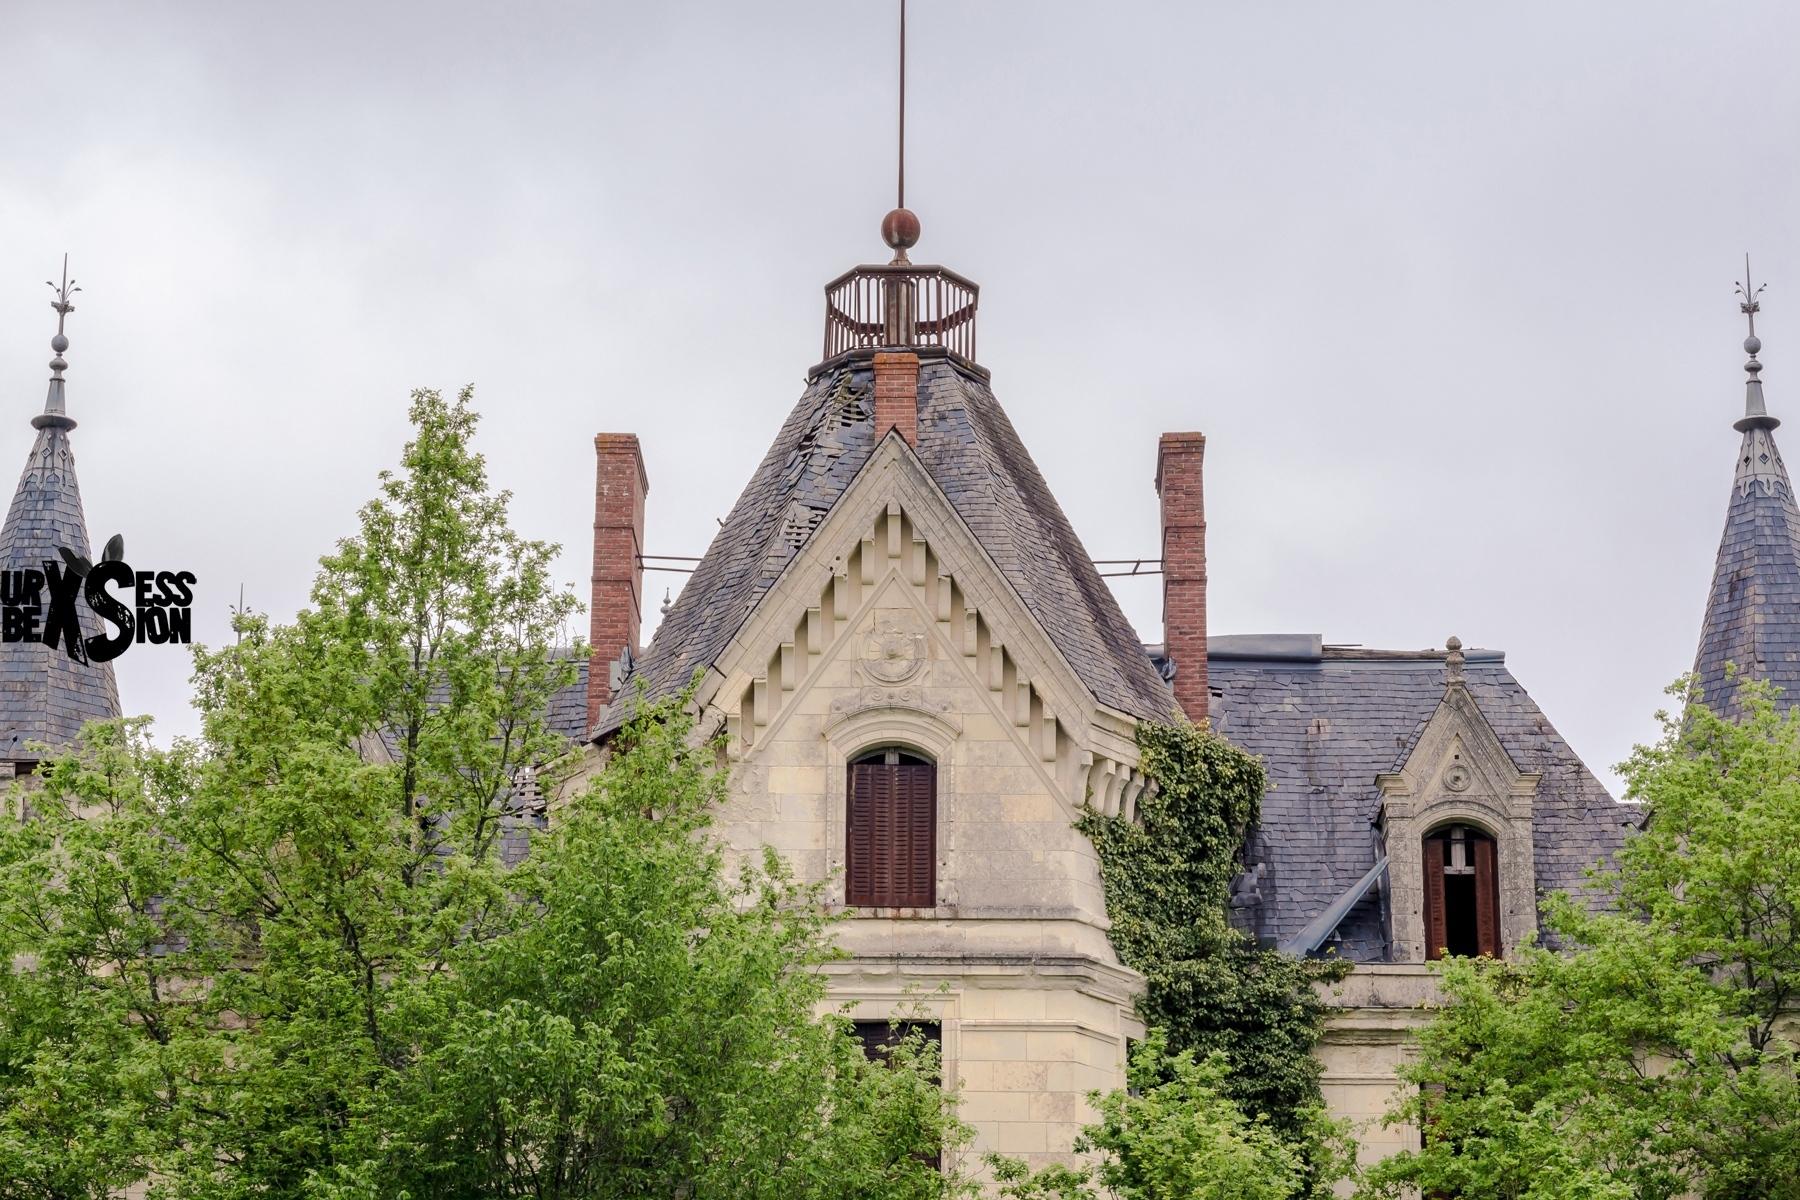 Château abandonné en France : https://urbexsession.com/chateau-vasiliy-kulik